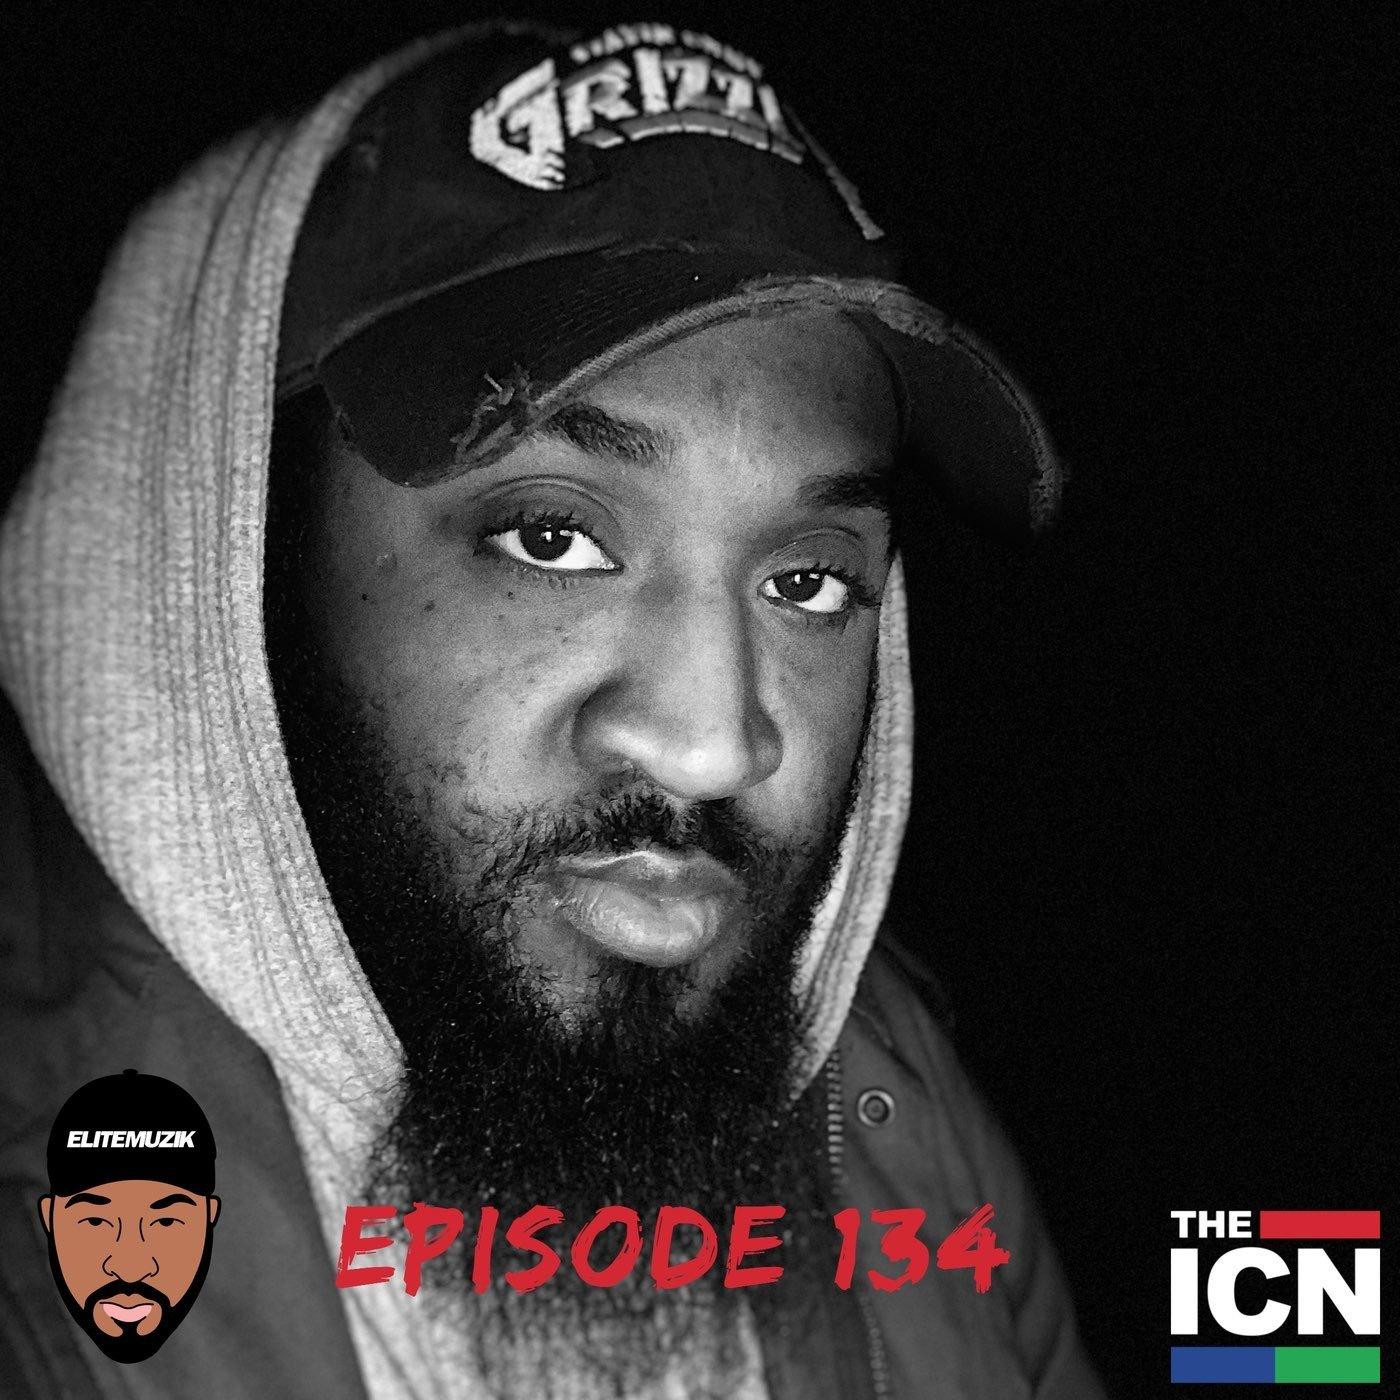 Episode 134